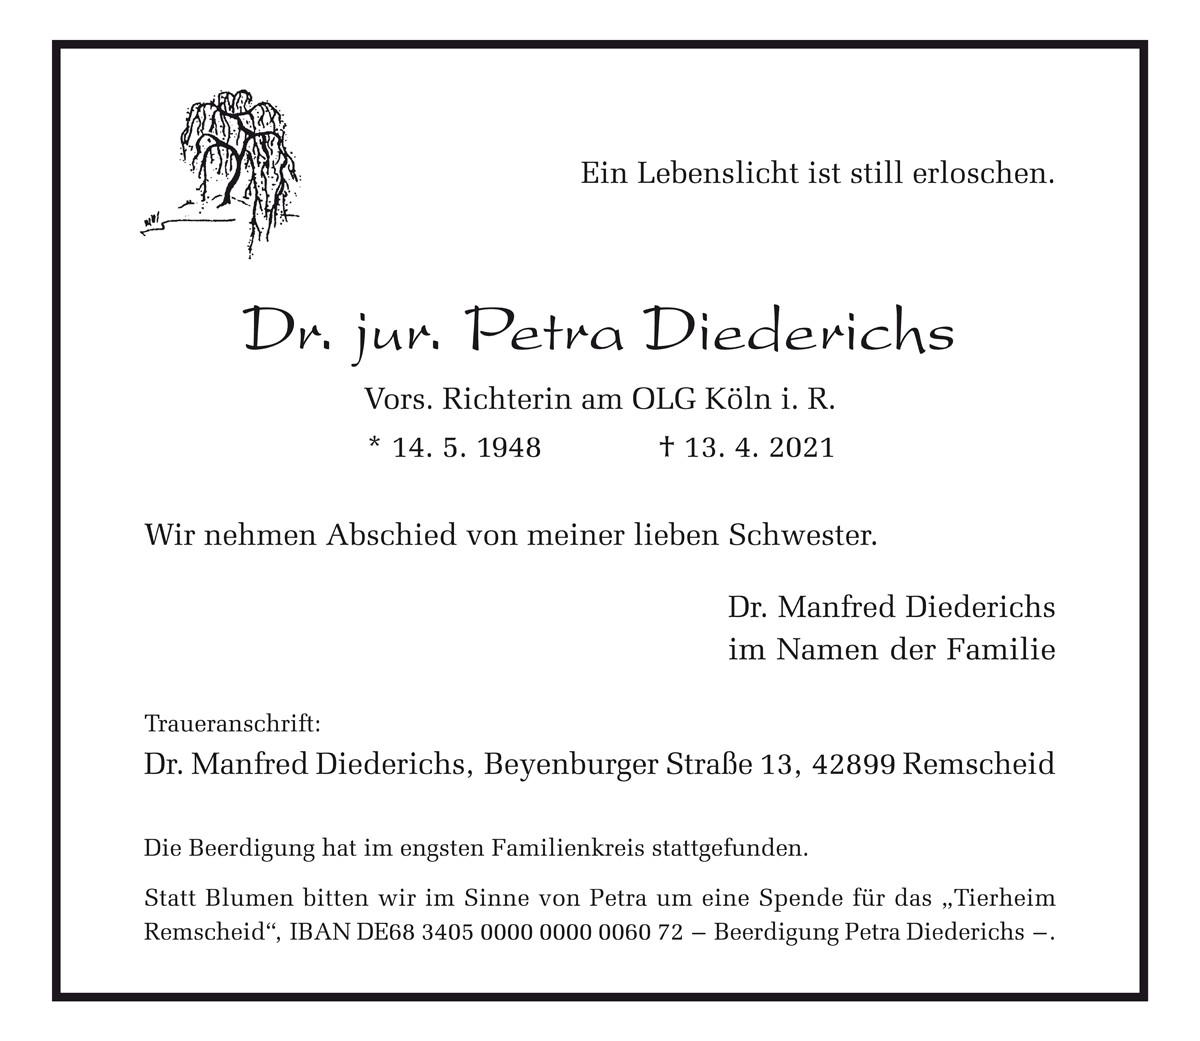 Dr. jur. Petra Diederichs – Vors. Richterin am OLG Köln i. R.